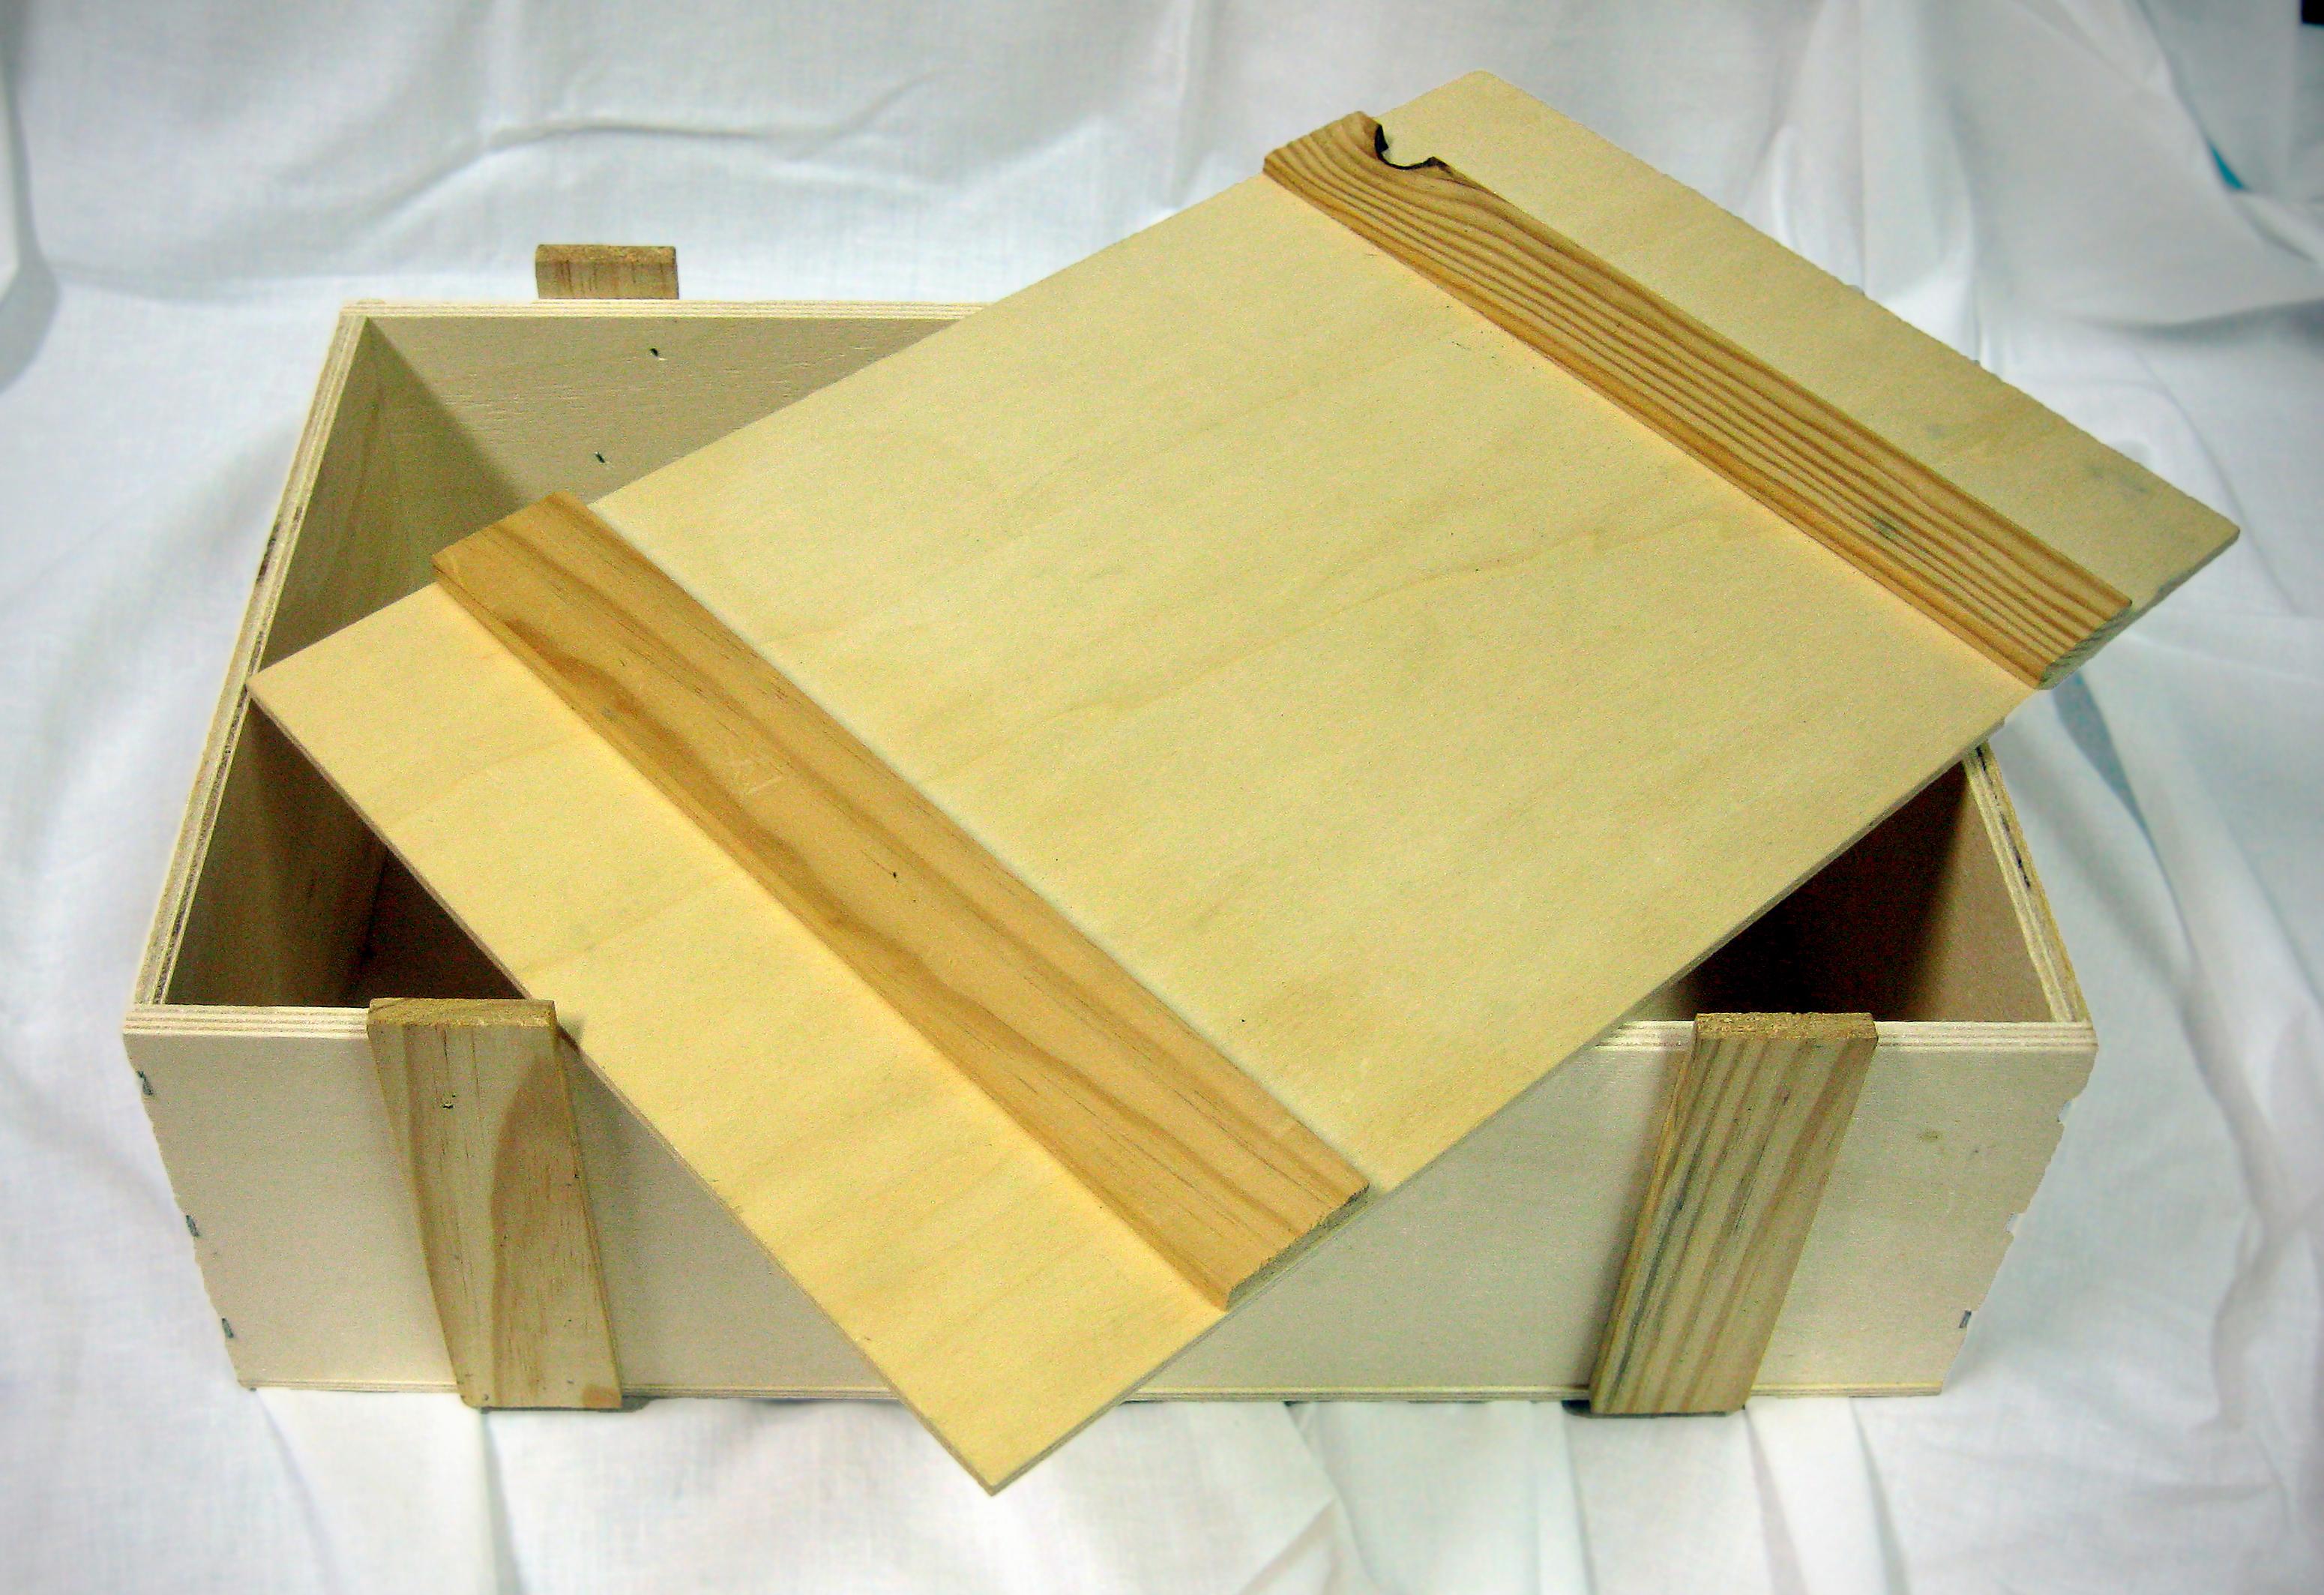 stunning caja vinos diy with cajas de vino de madera decoradas - Cajas De Vino Decoradas